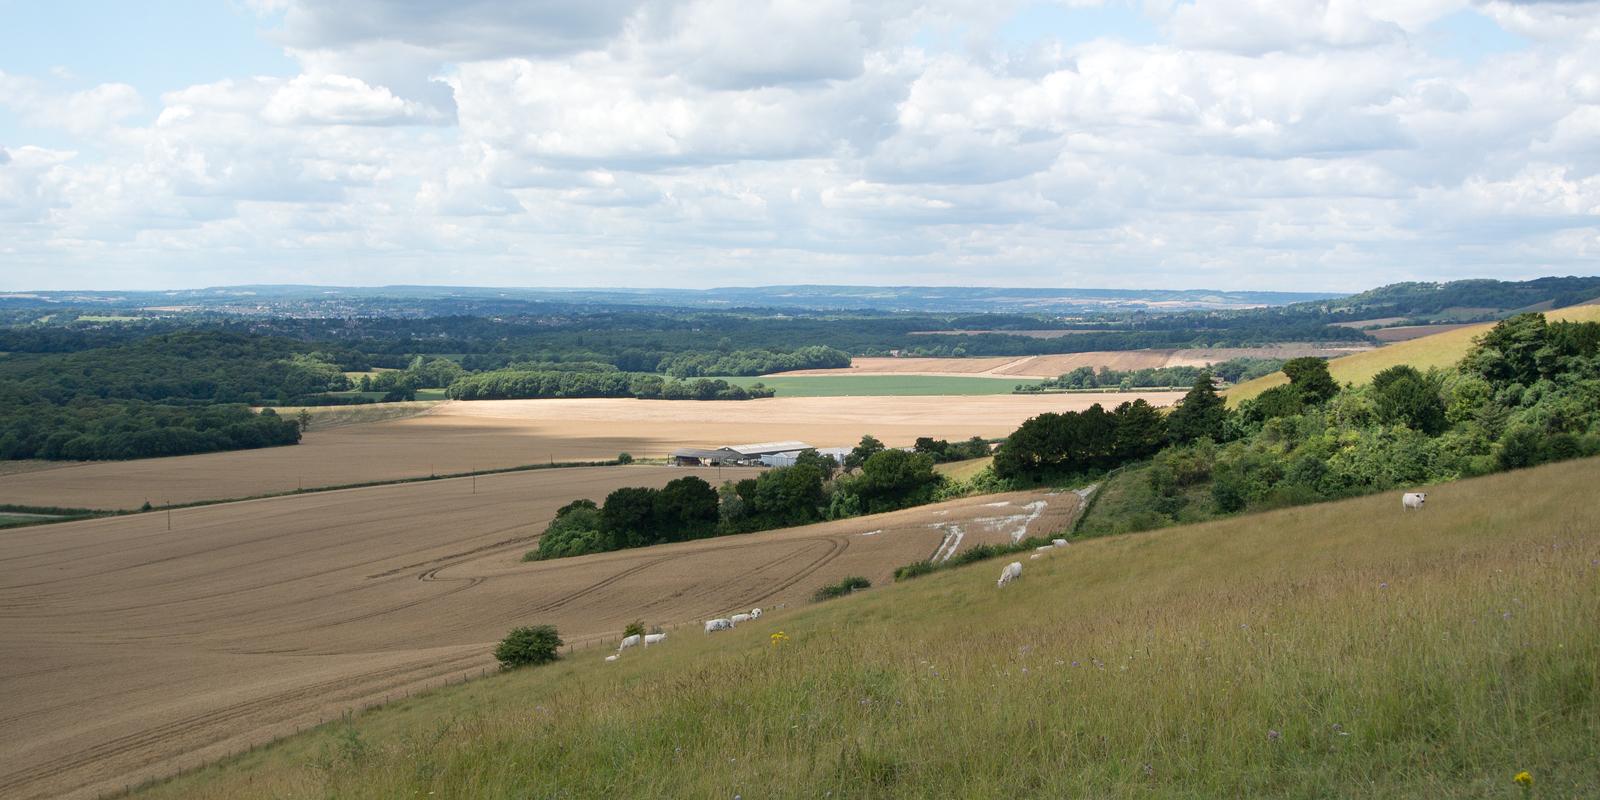 North Downs Way Hollingbourne Circular via Hucking